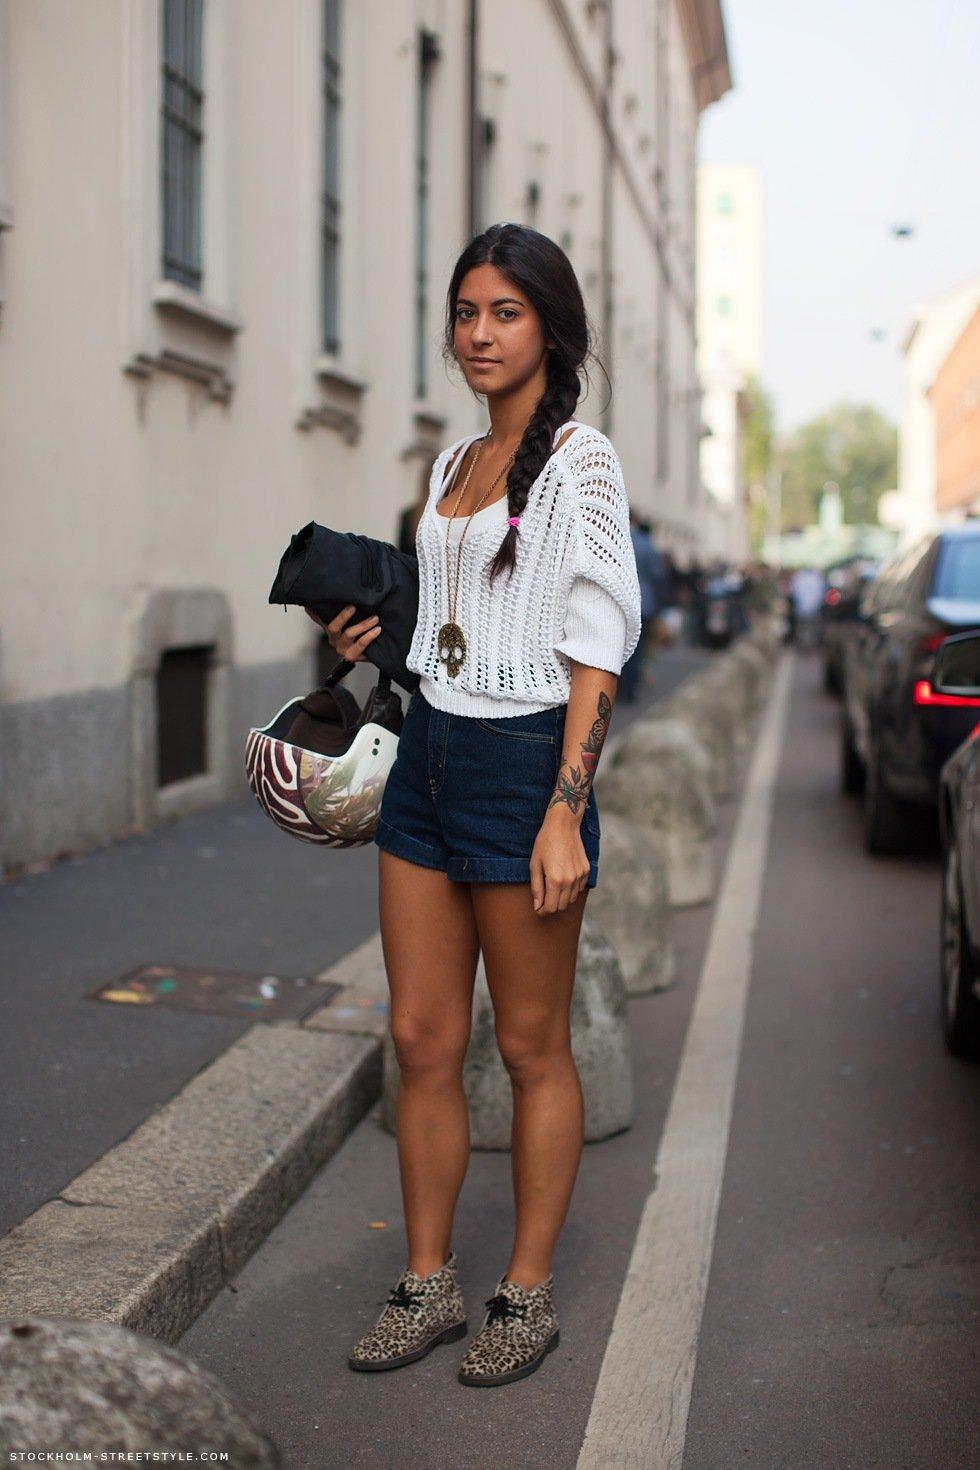 Fashion Street Style Inspiration